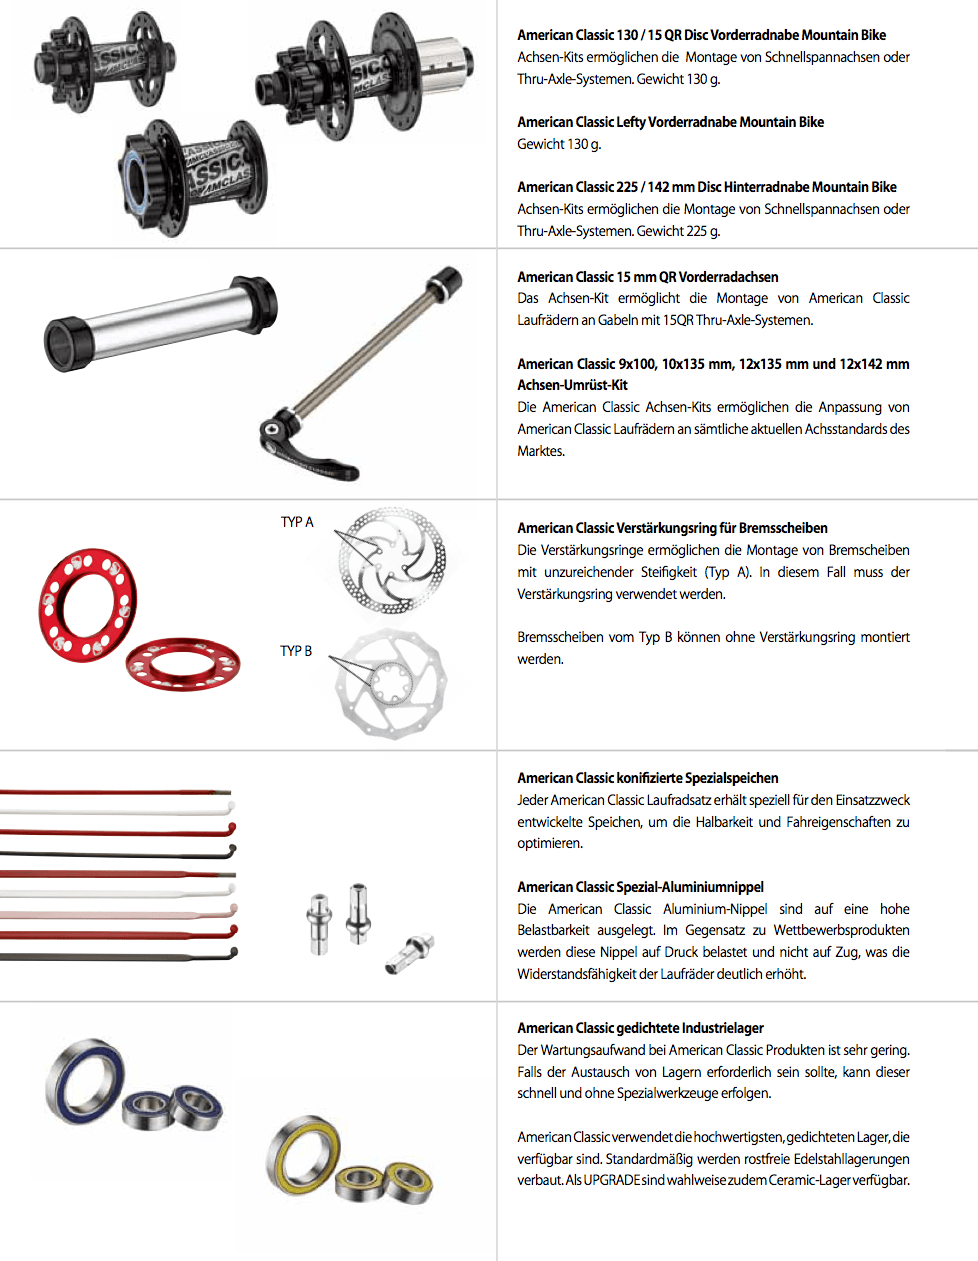 americanclassic_komponenten_details_revolutionsports_vertrieb